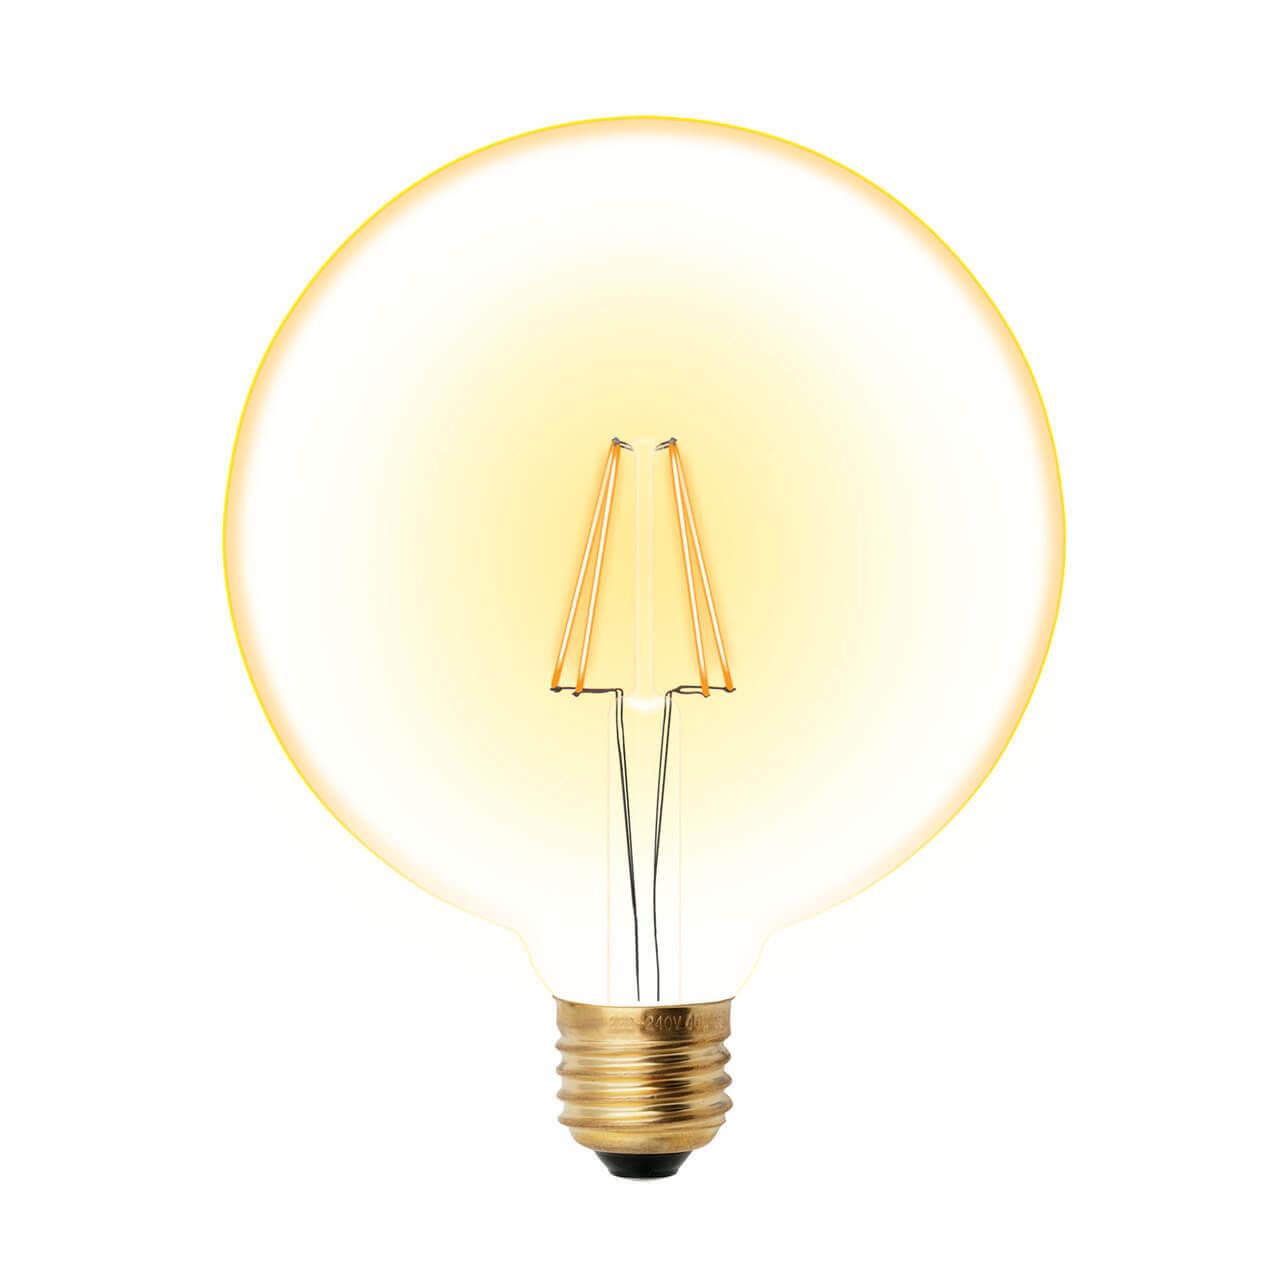 Лампочка Uniel LED-G125-8W/GOLDEN/E27 GLV21GO Vintage лампа светодиодная филаментная ul 00001818 uniel e27 4w 2250k прозрачная led g95 4w golden e27 cw glv21go